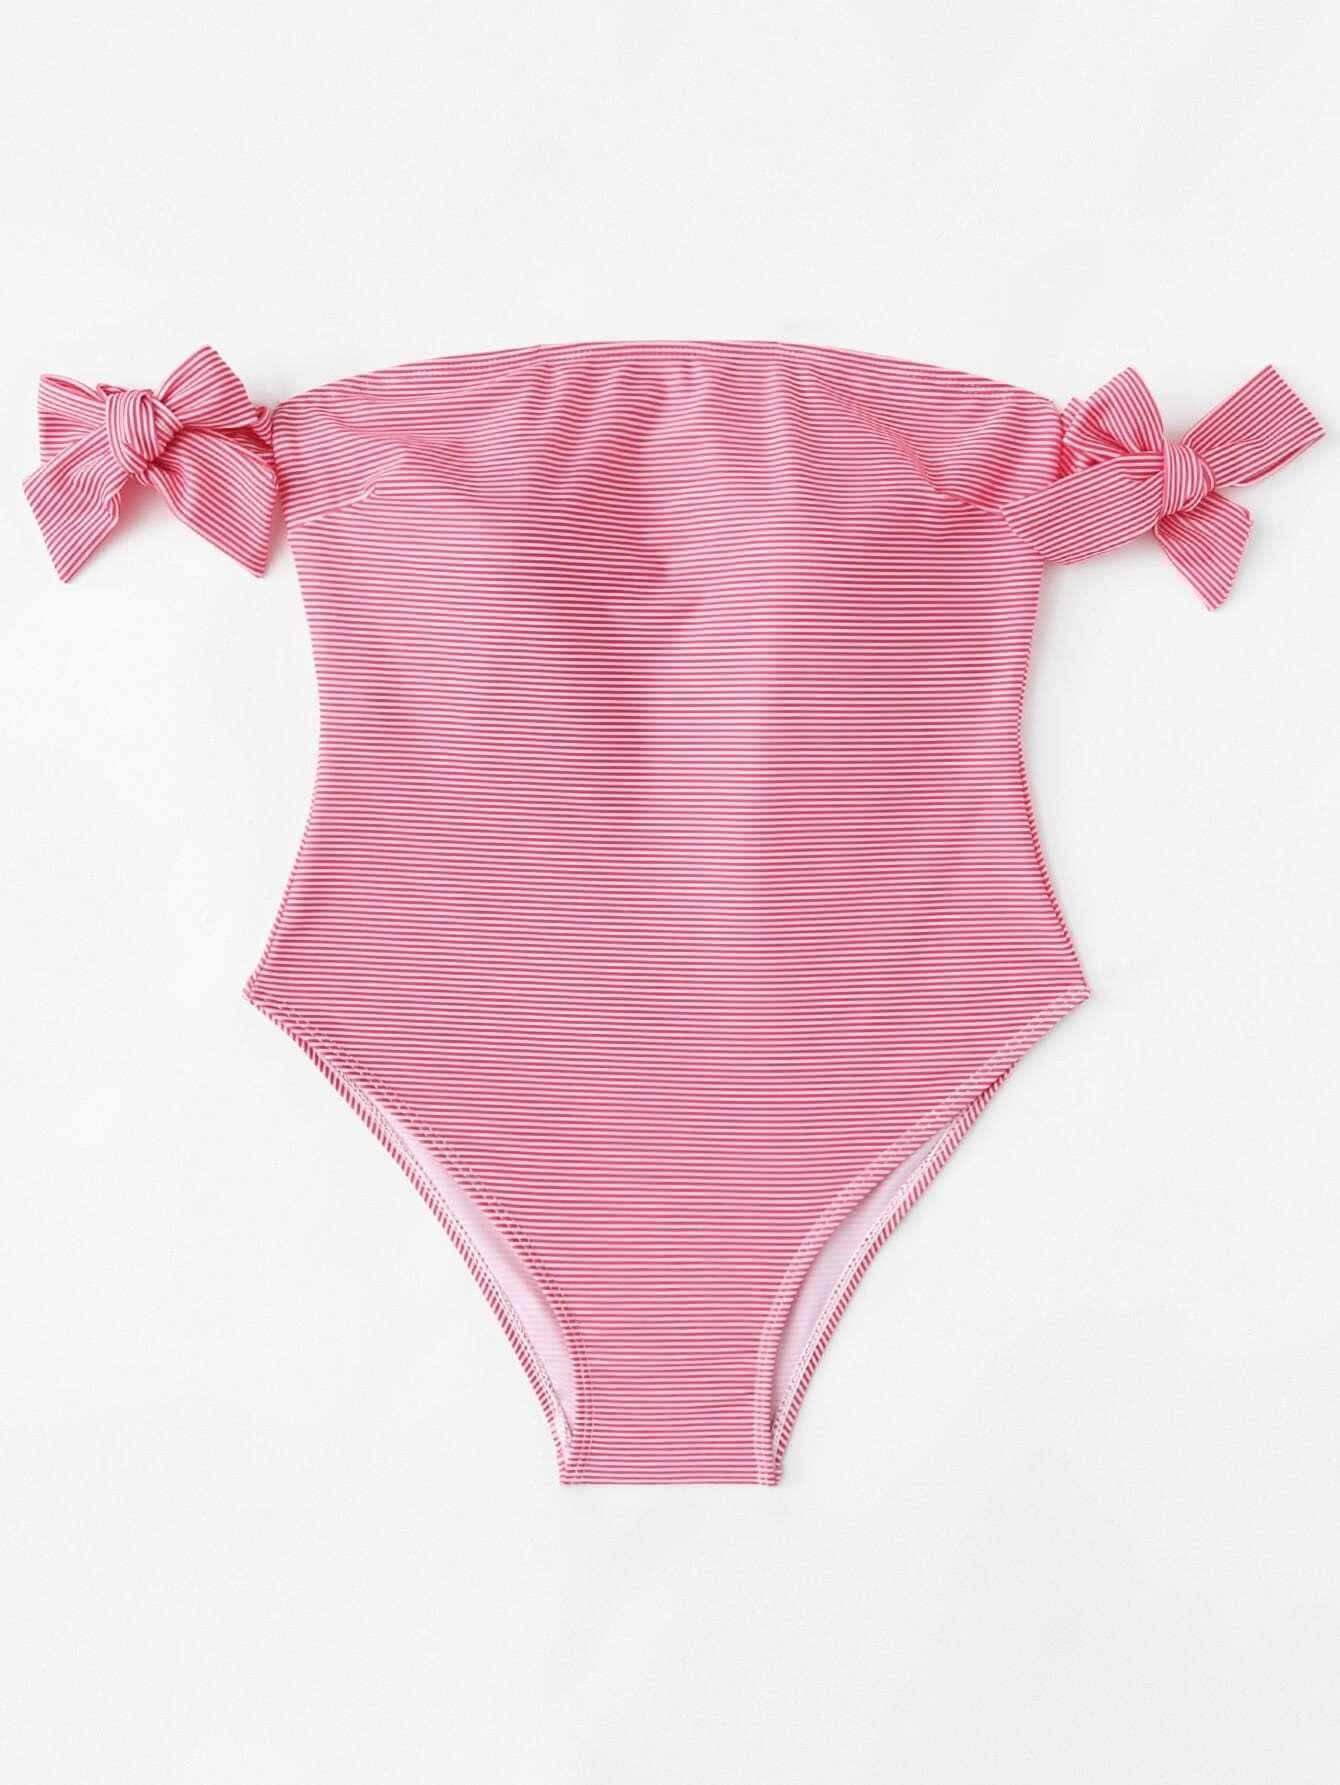 Bow Tie Striped Bardot Swimsuit